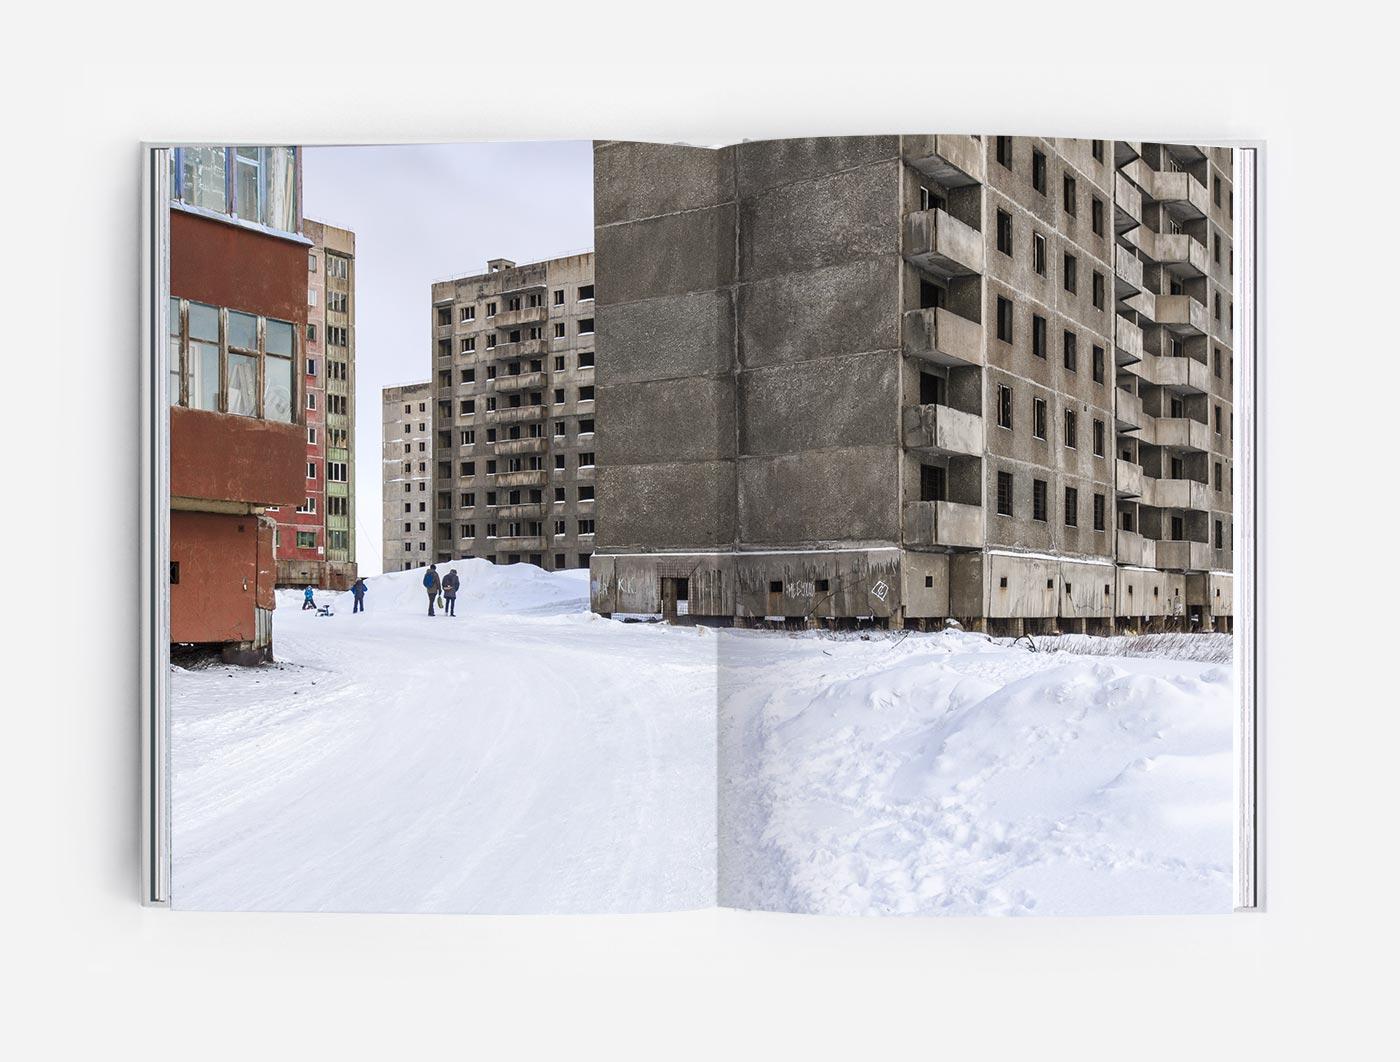 Oganer microrayon in Norilsk